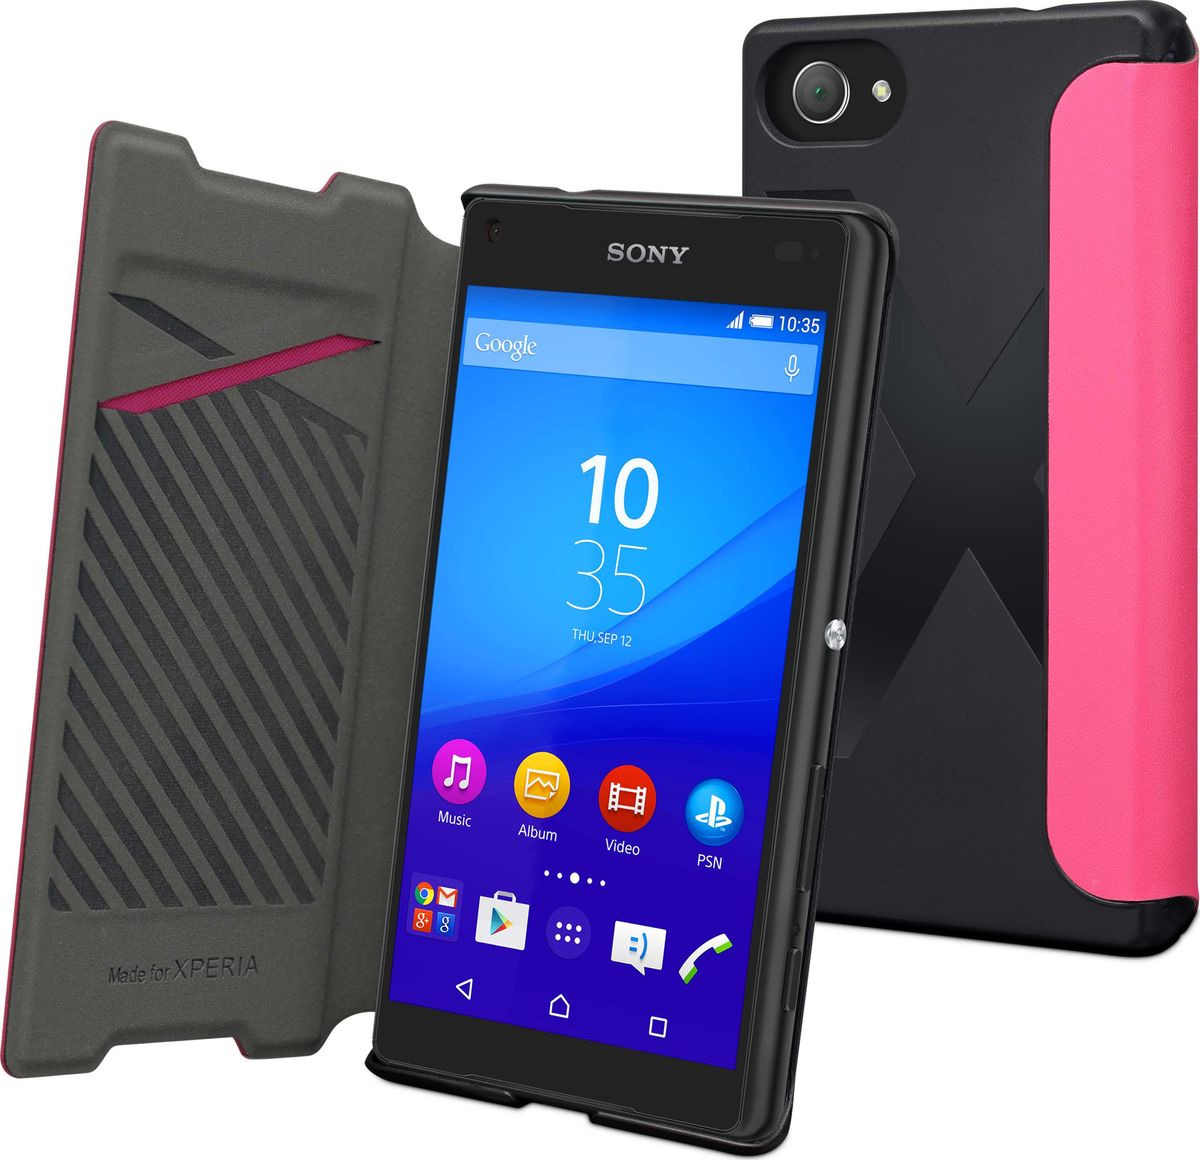 Чехол для сотового телефона Muvit MFX Easy Folio Case для Sony Xperia Z5 Compact, SEEAF0036, розовый цена